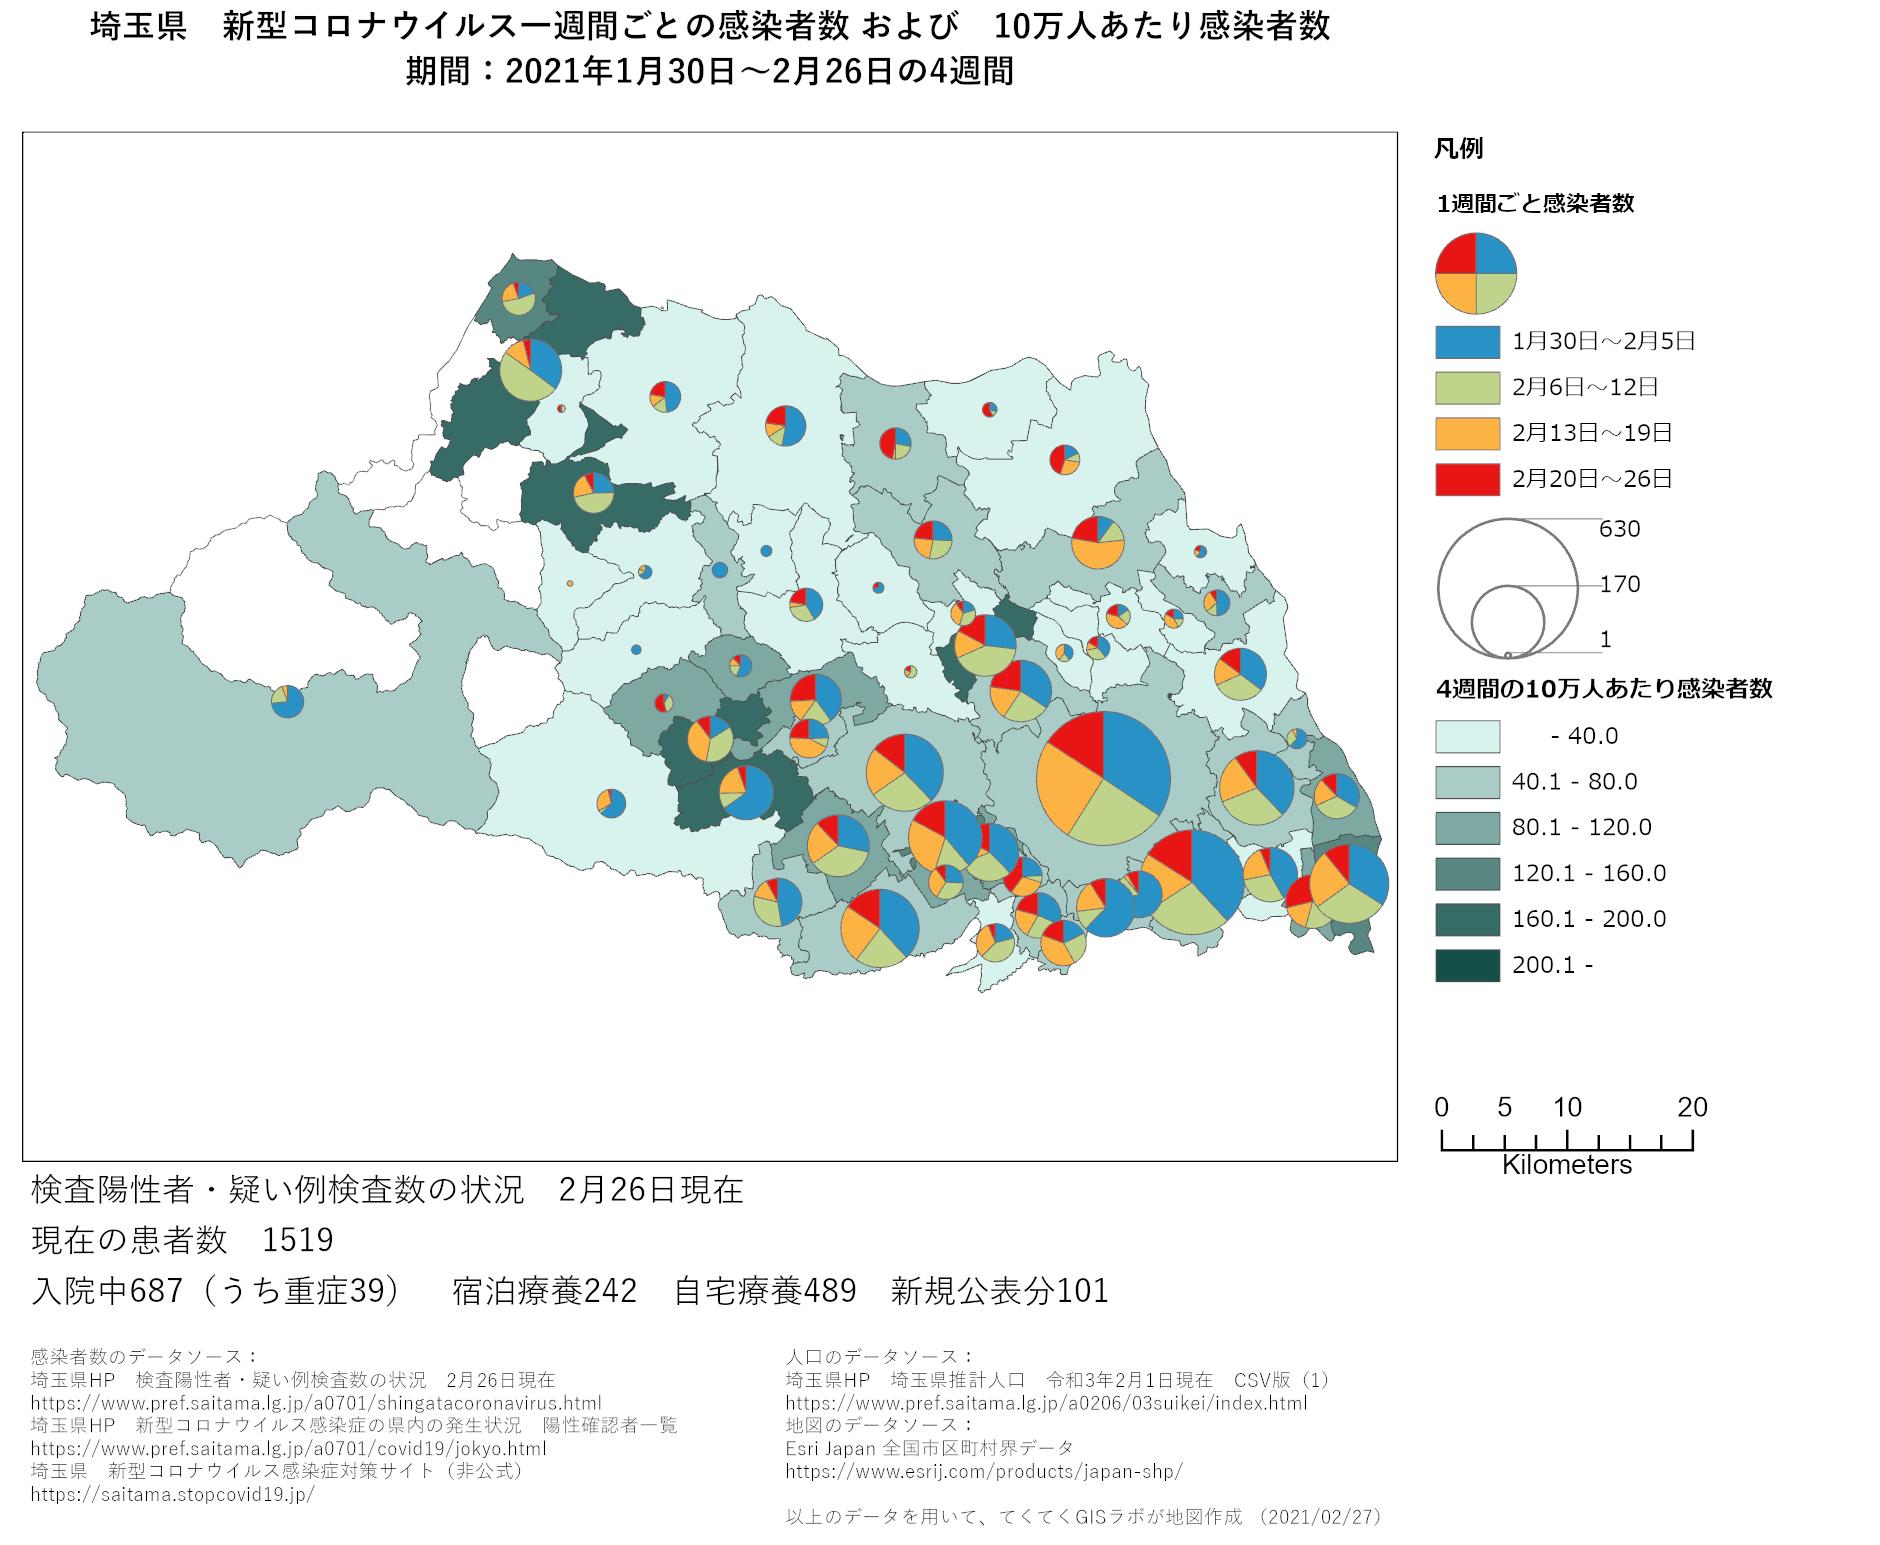 1週間ごと感染者数、埼玉県、1月30日〜2月26日